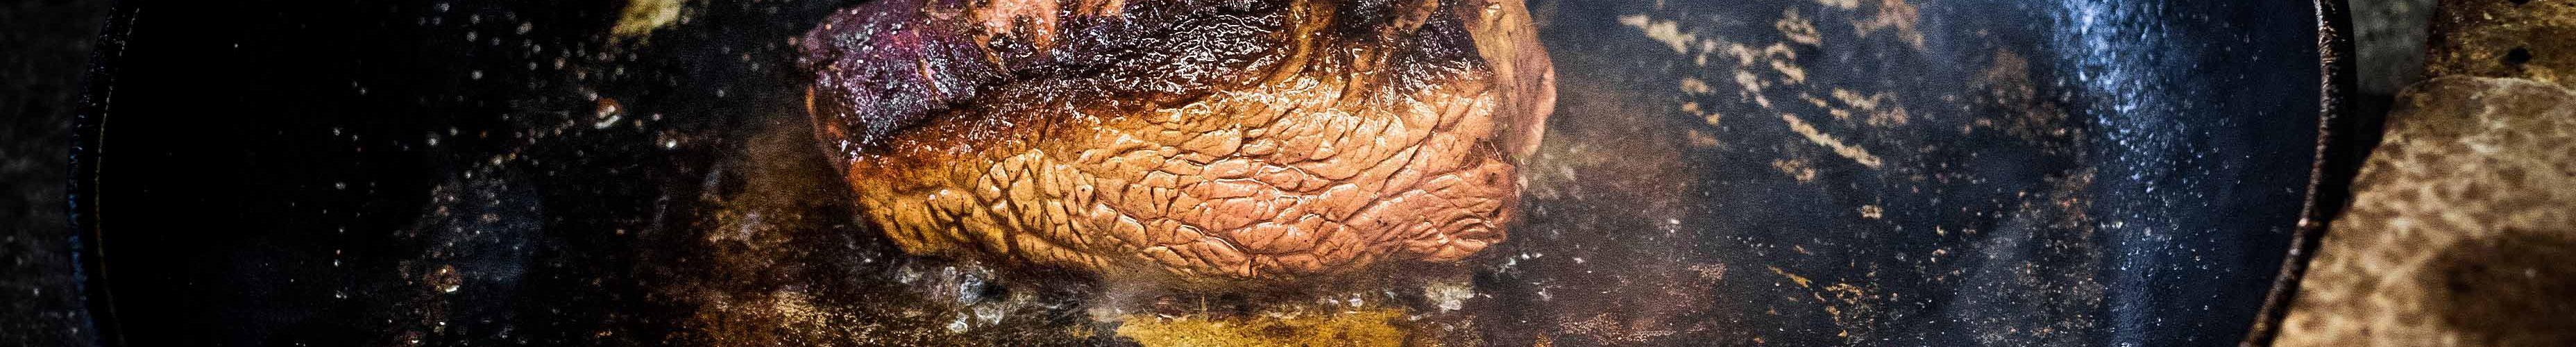 Coeur de rumstek de viande irlandaisePhoto : Nicolas Gouhier